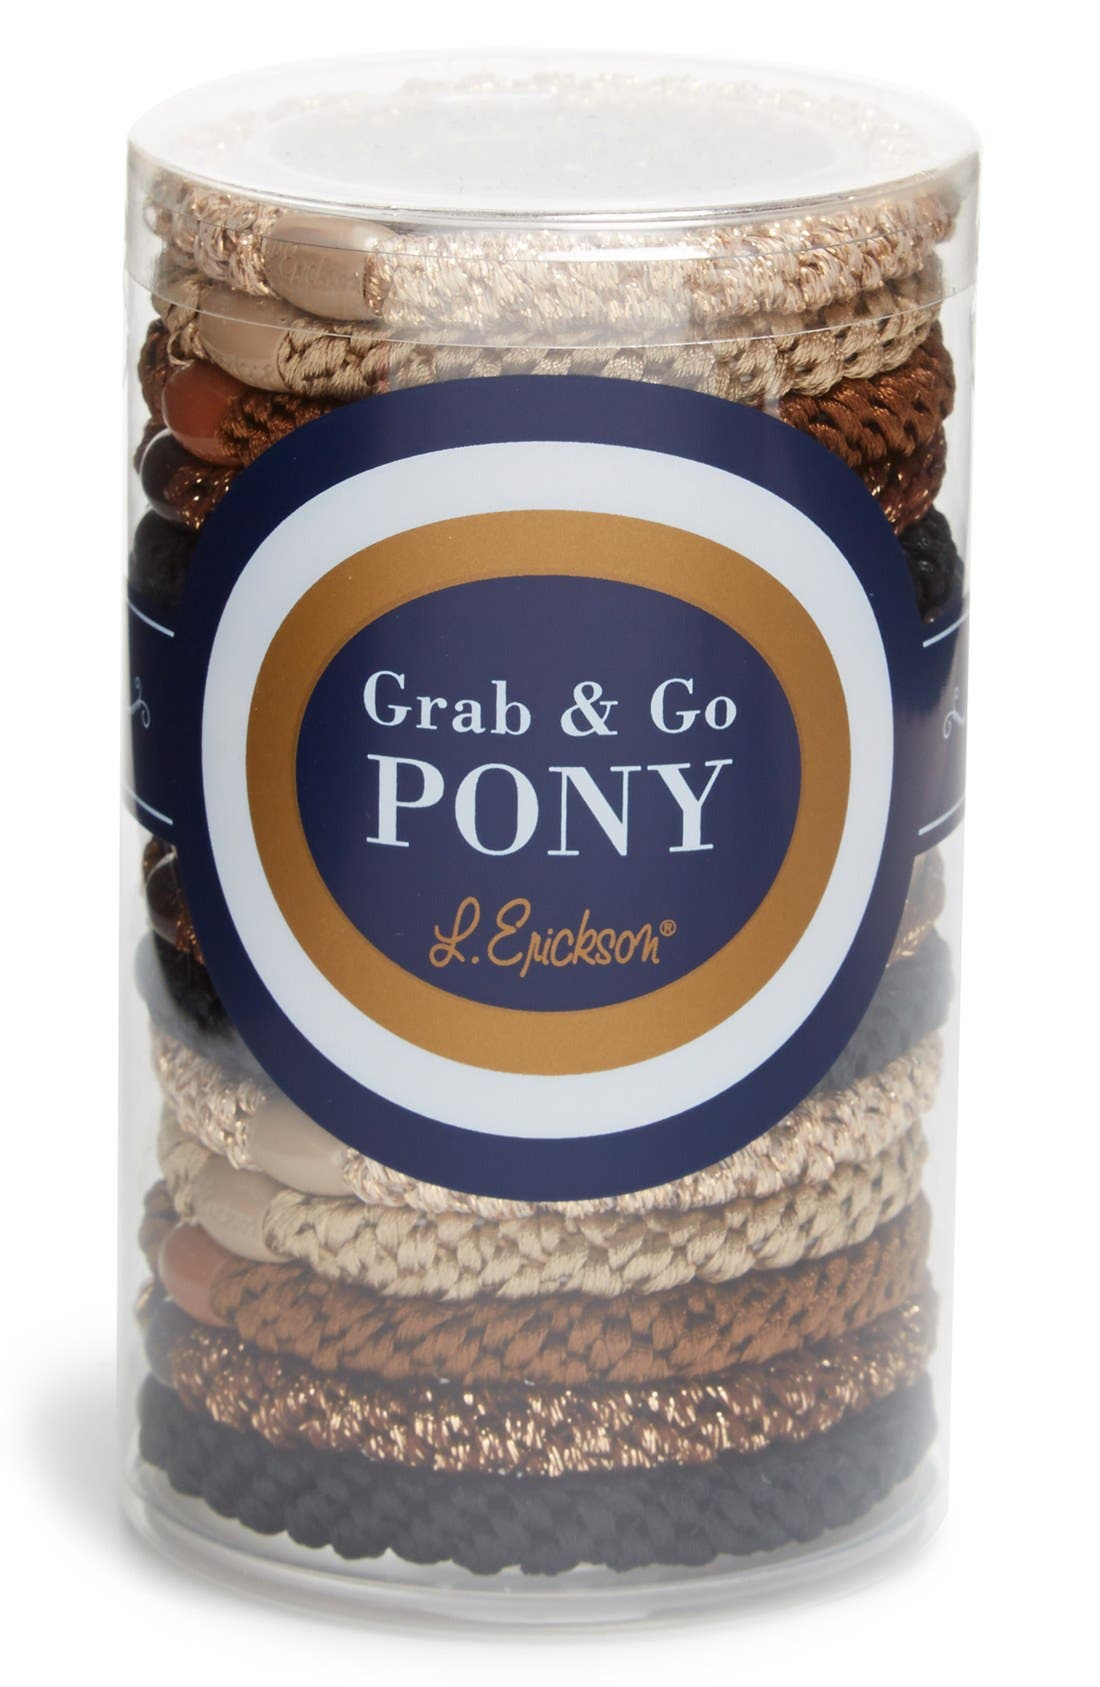 Grab & Go Set Of 15 Ponytail Holders in Neutral Metallic